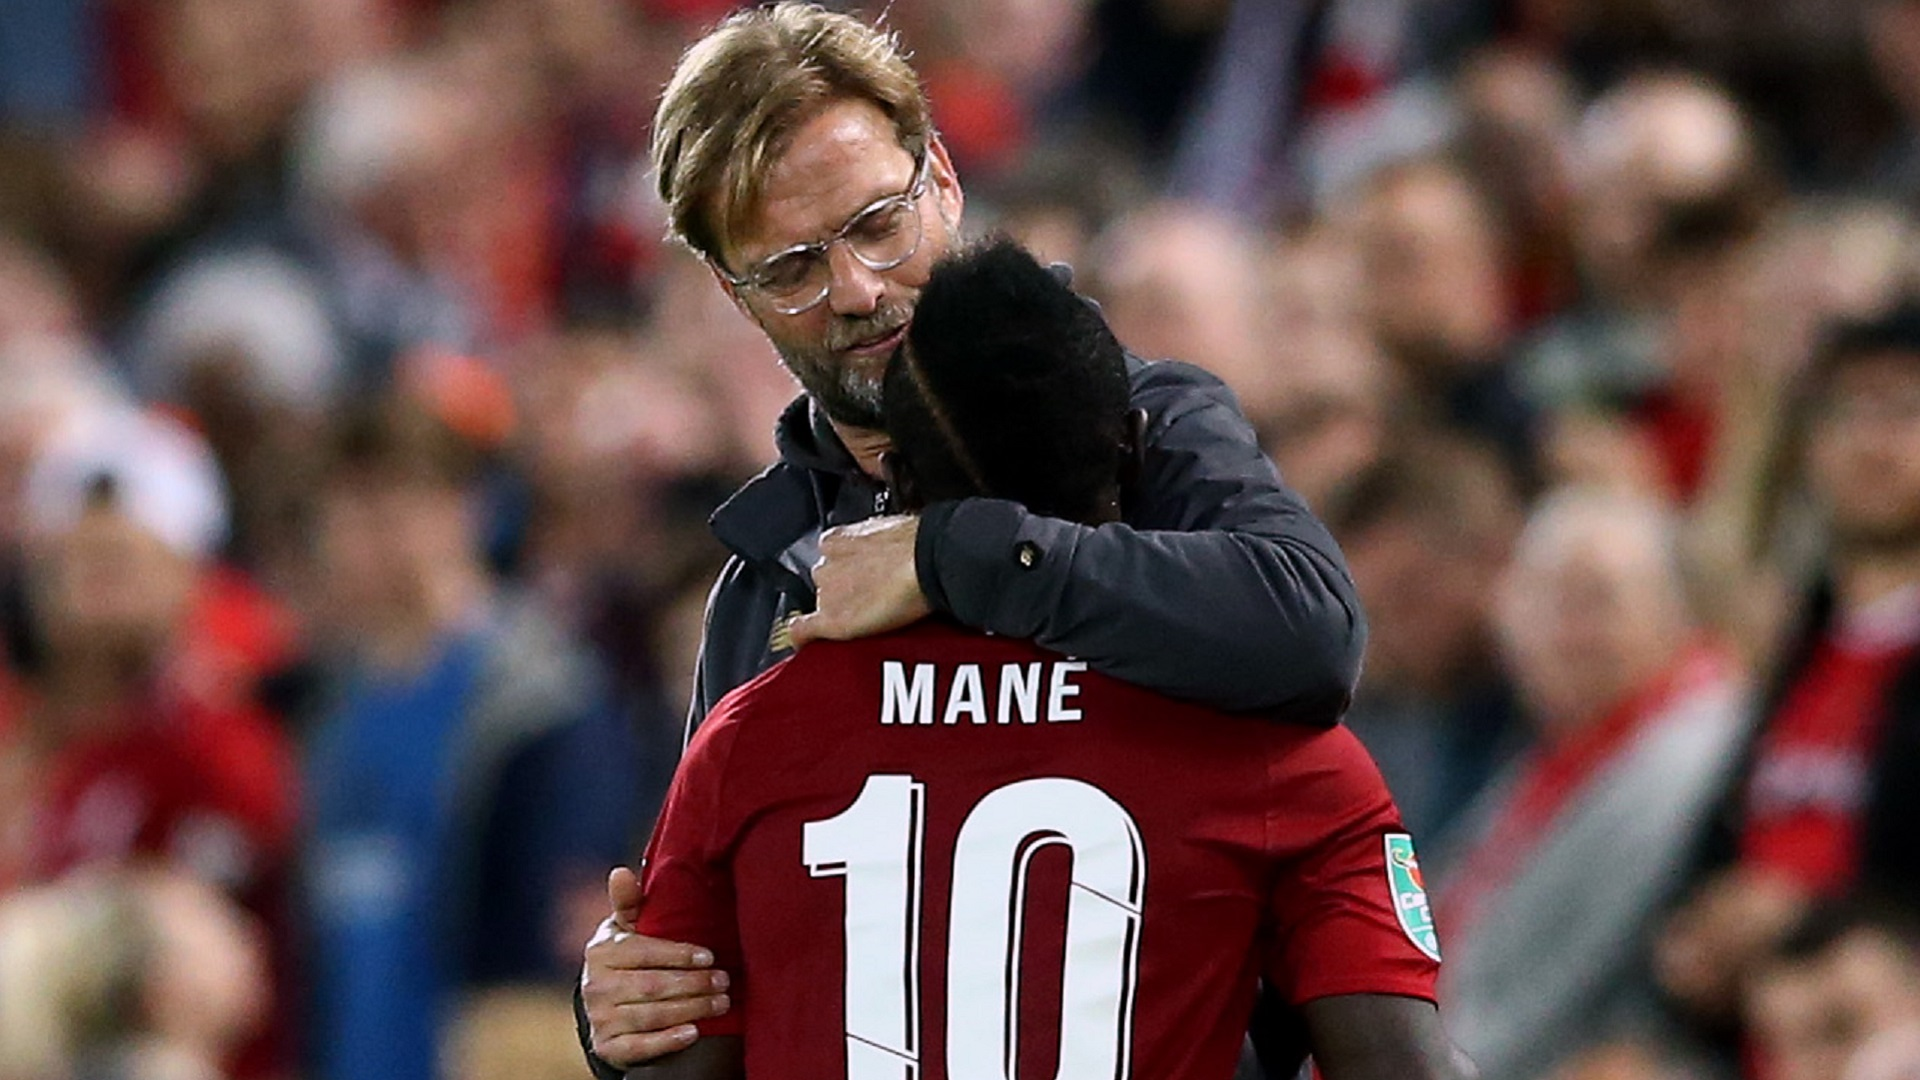 2018-09-29 Mane Klopp Liverpool